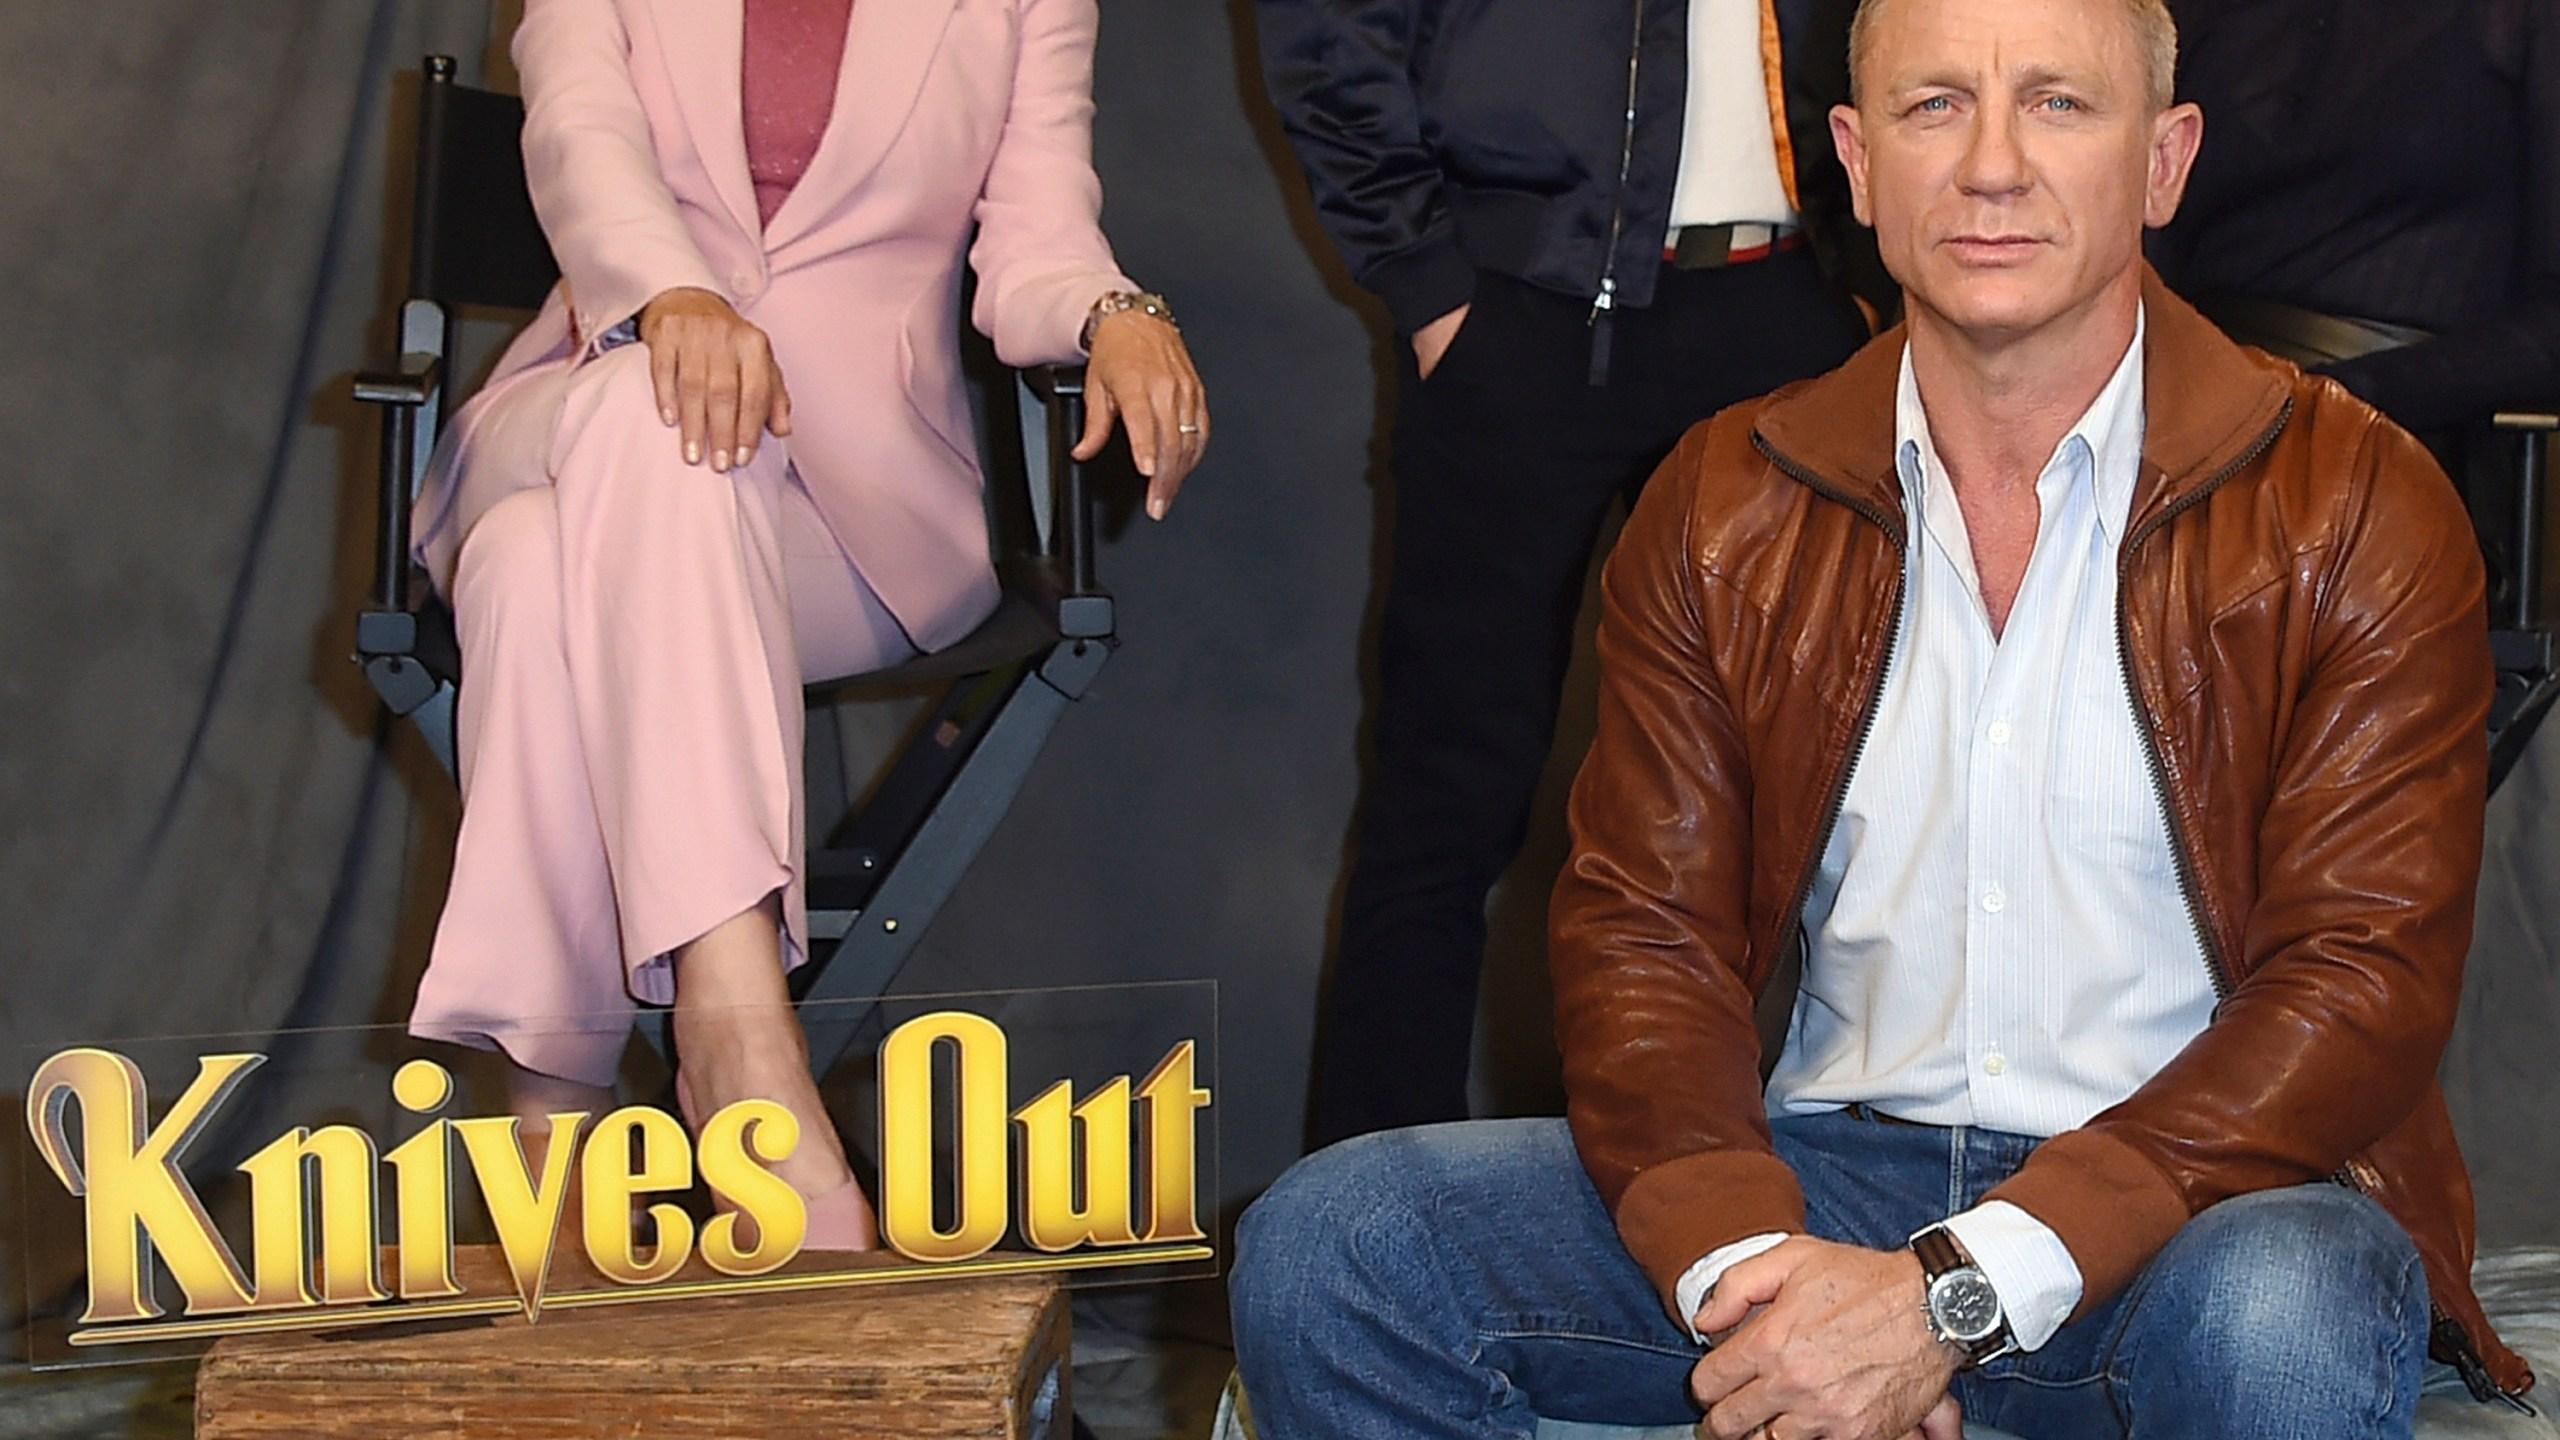 Jamie Lee Curtis, Chris Evans, Daniel Craig, Ana de Armas